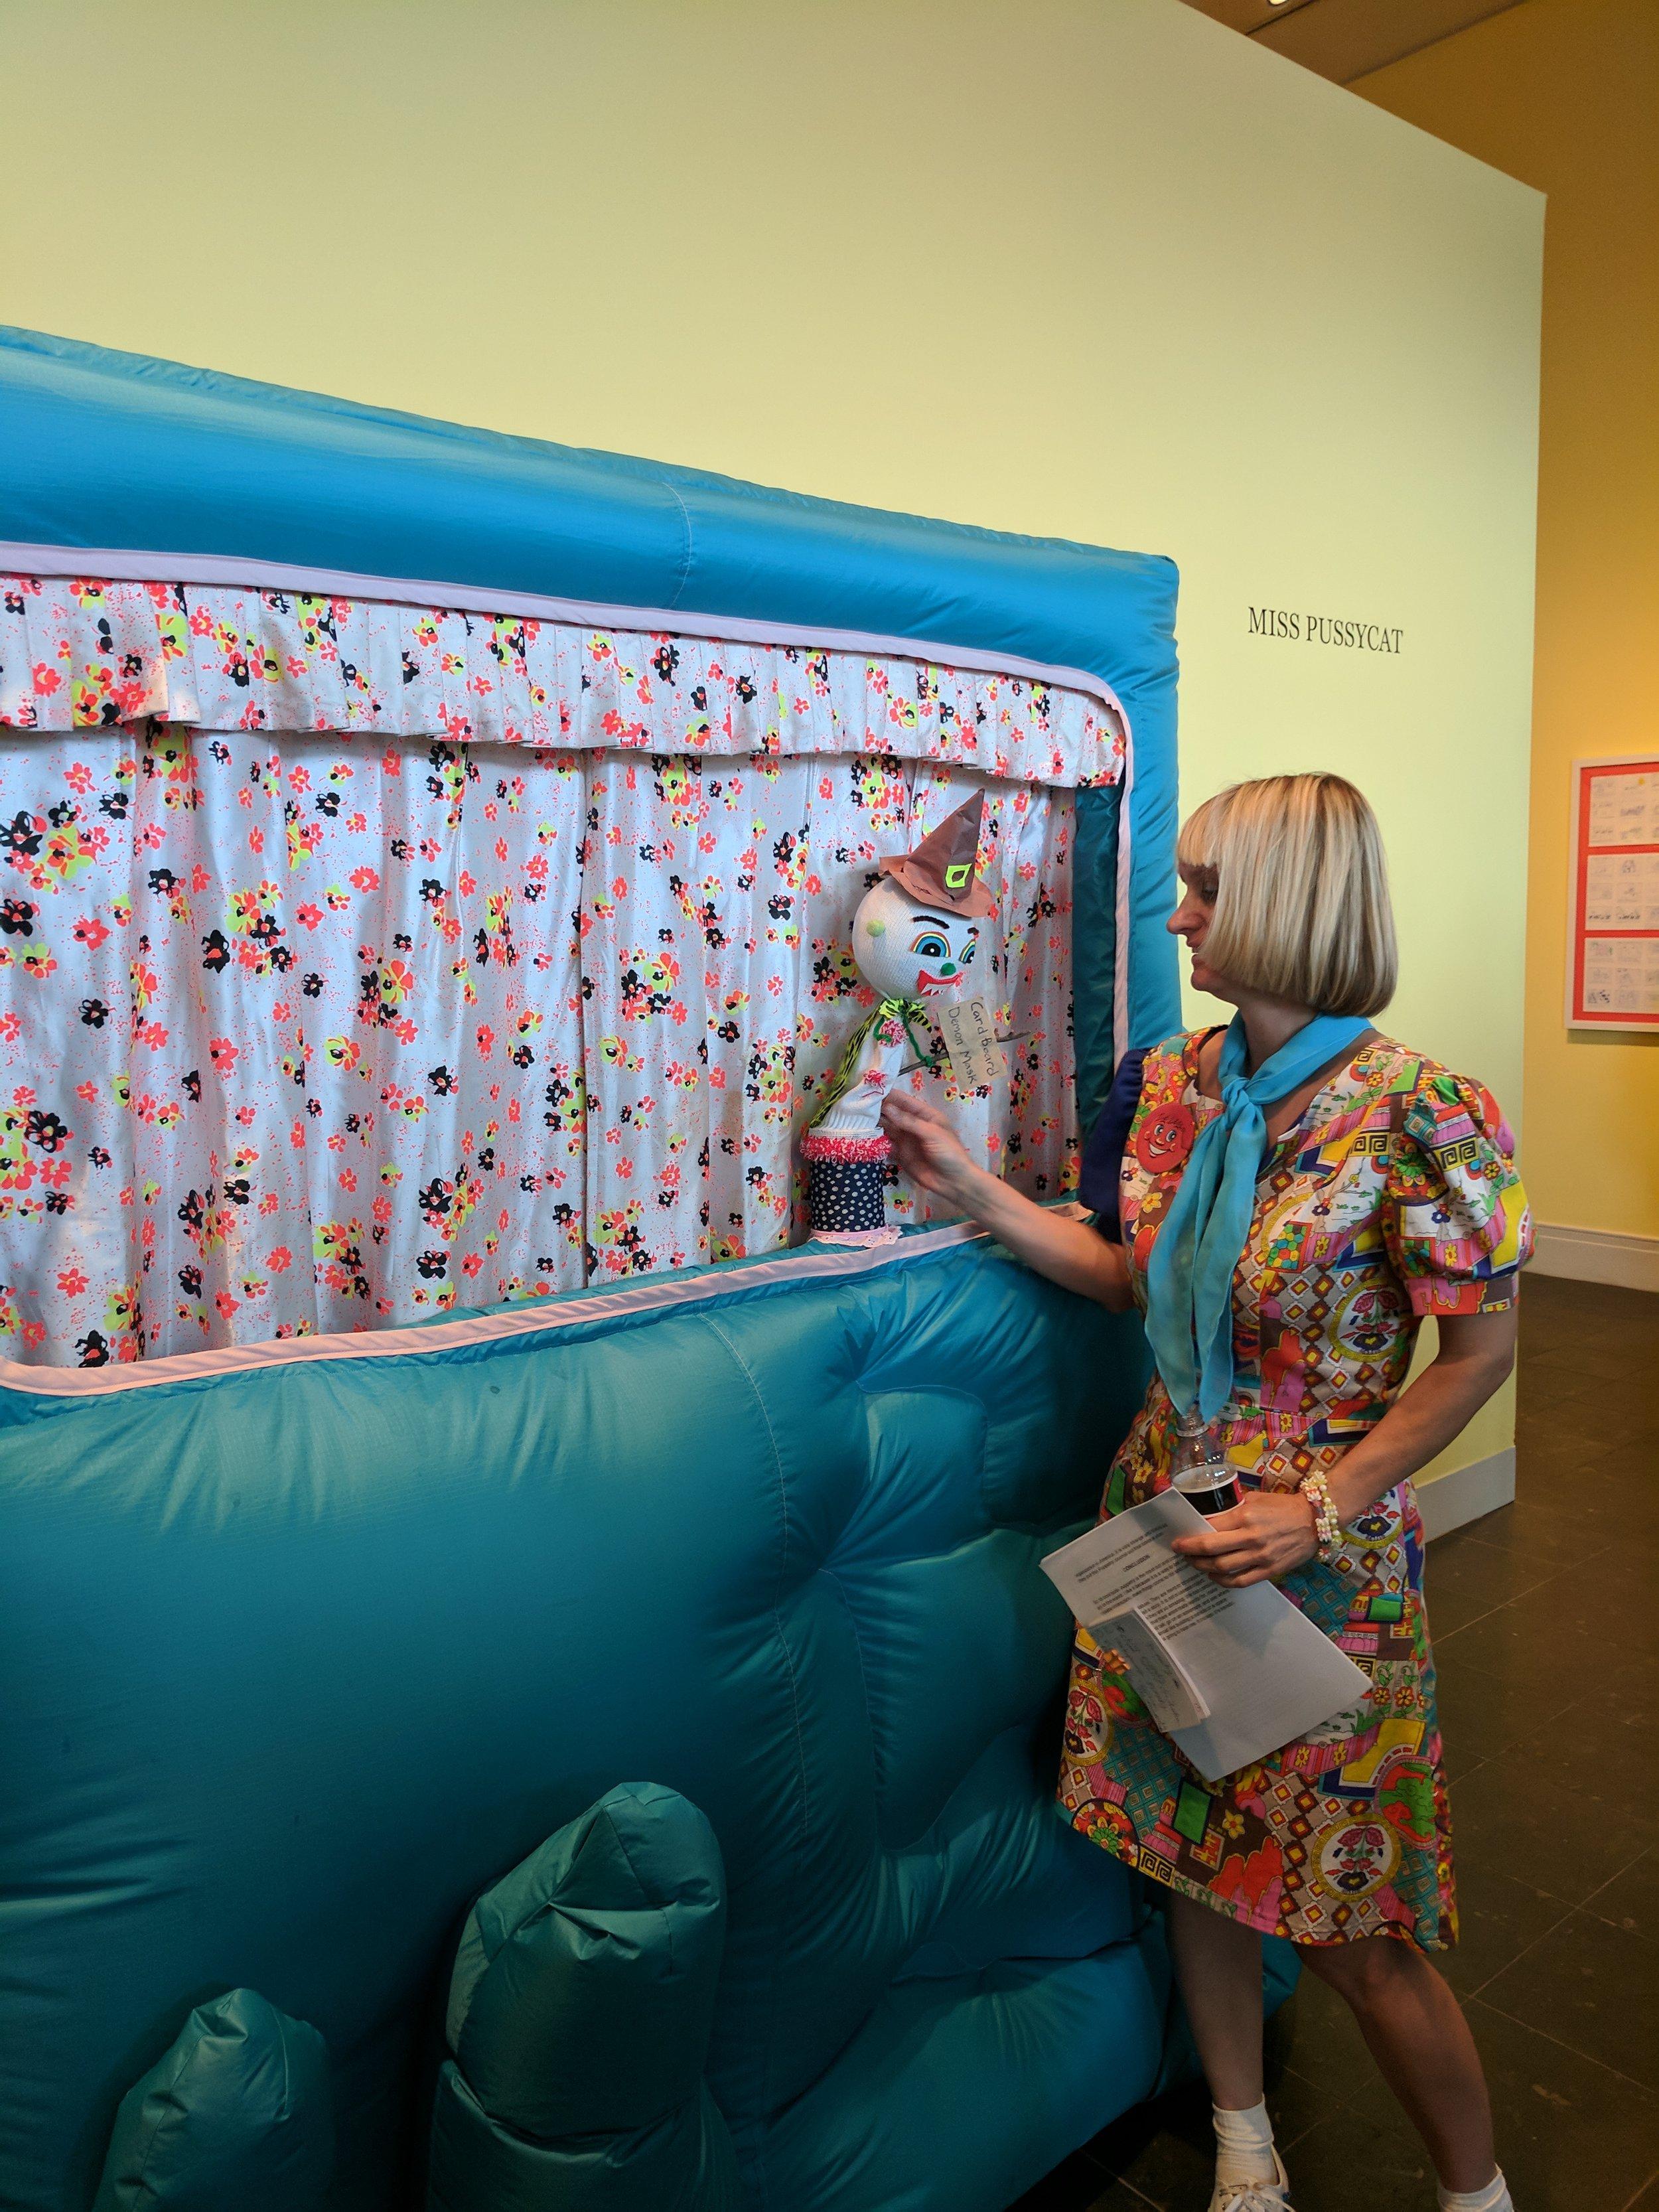 Miss Pussycat Giving Gallery Walkthrough at Ogden Museum of Southern Art